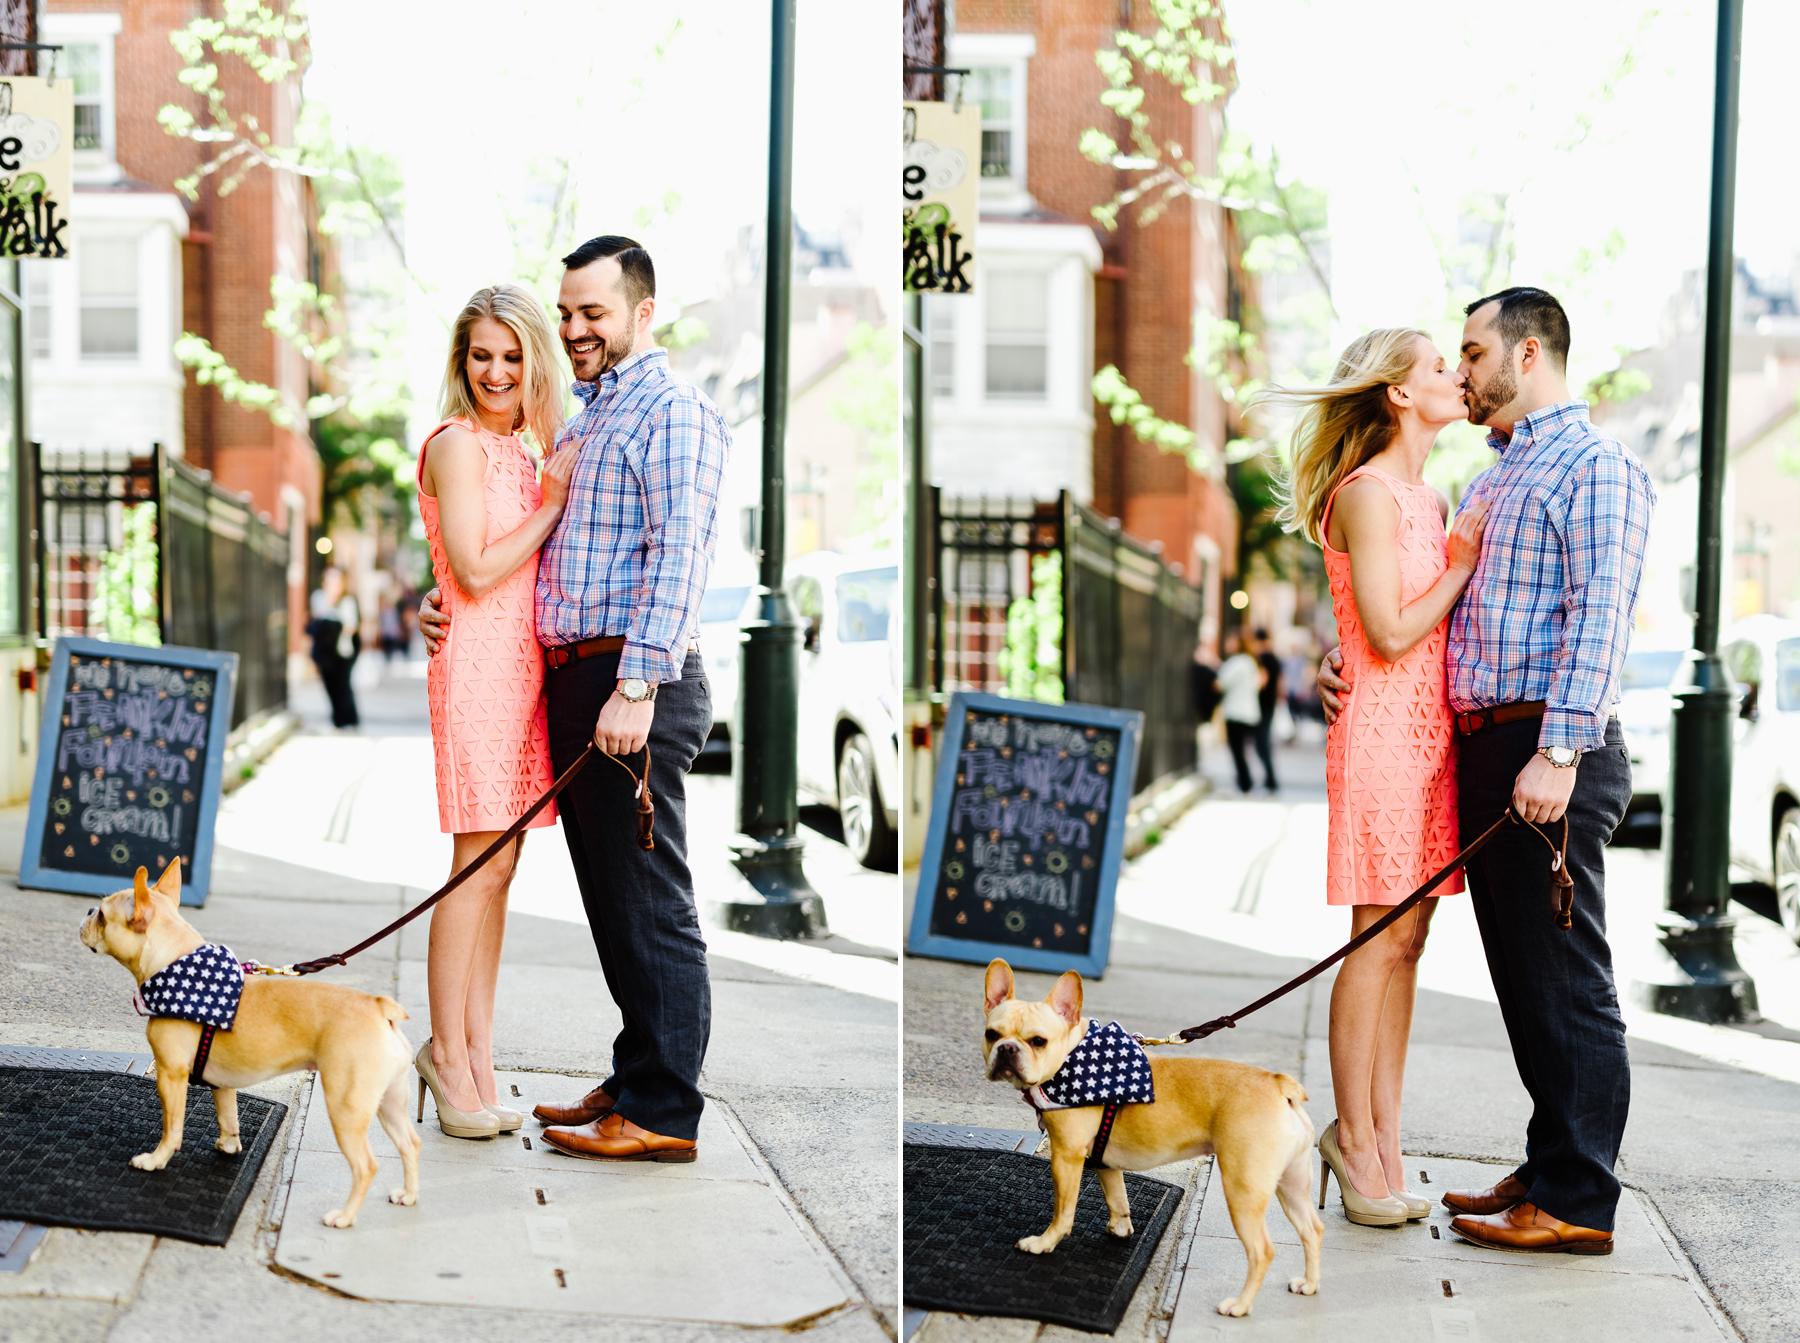 1-City Hall Philadelphia Engagement Shoot Old City Phildelphia Engagement Photos Philadelphia Wedding Photographer South Philly Weddings Longbrook Photography_004.jpg